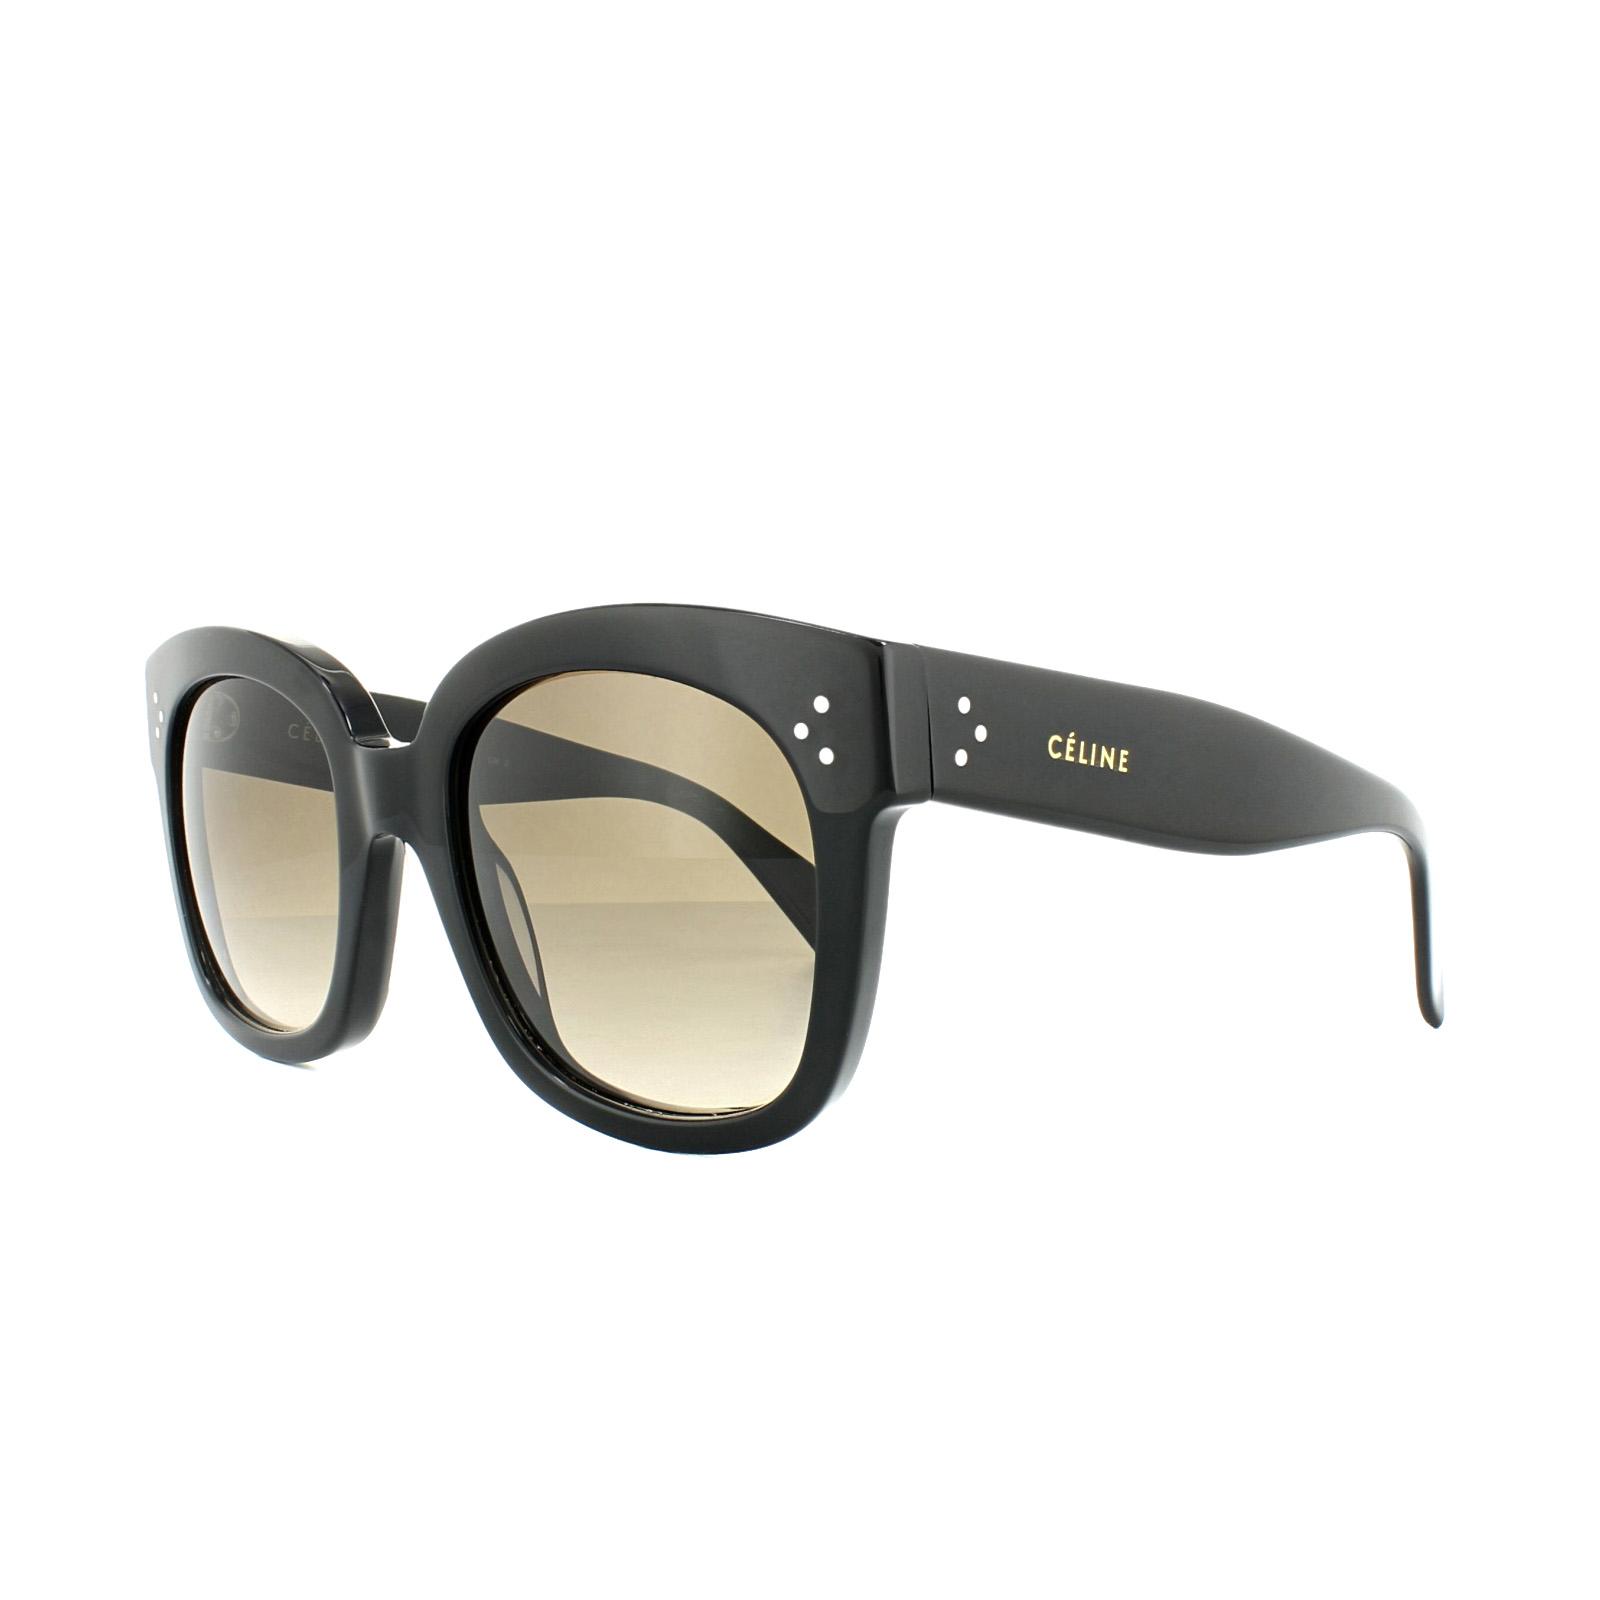 775b558d615 Sentinel Celine Sunglasses 41805 S New Audrey 807 HA Black Brown Gradient